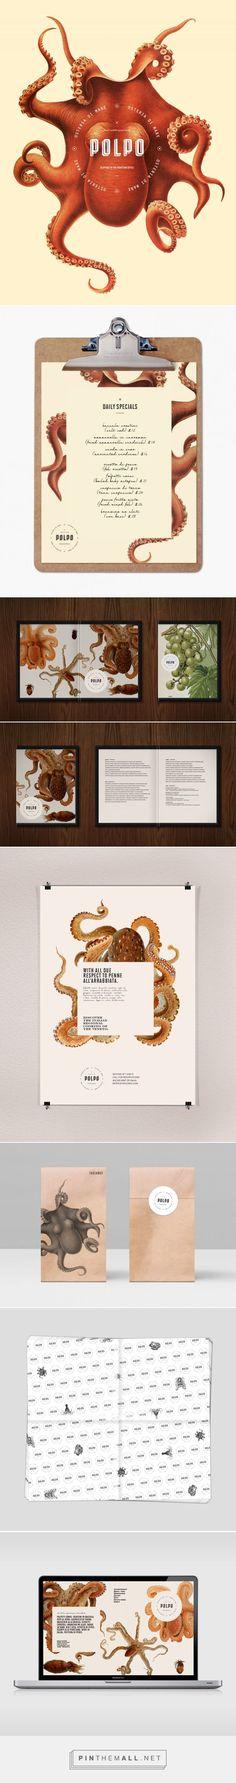 Polpo Restaurant Branding and Menu Design by Richard Marazzi | Fivestar Branding Agency – Design and Branding Agency & Inspiration Gallery